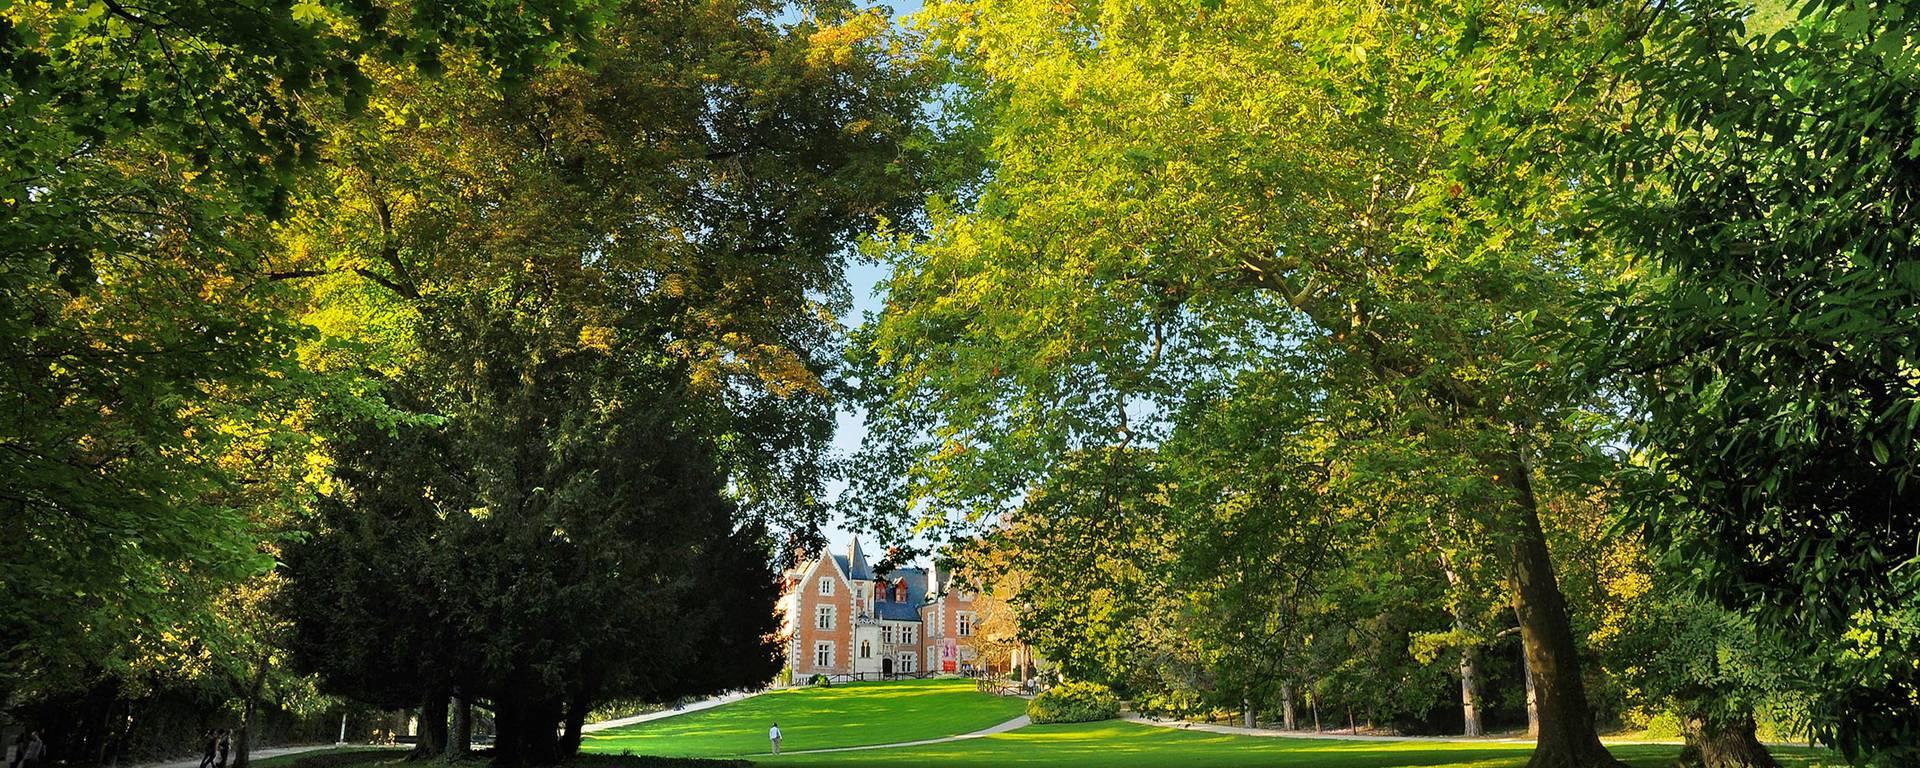 Schlosspark von Le Clos Lucé